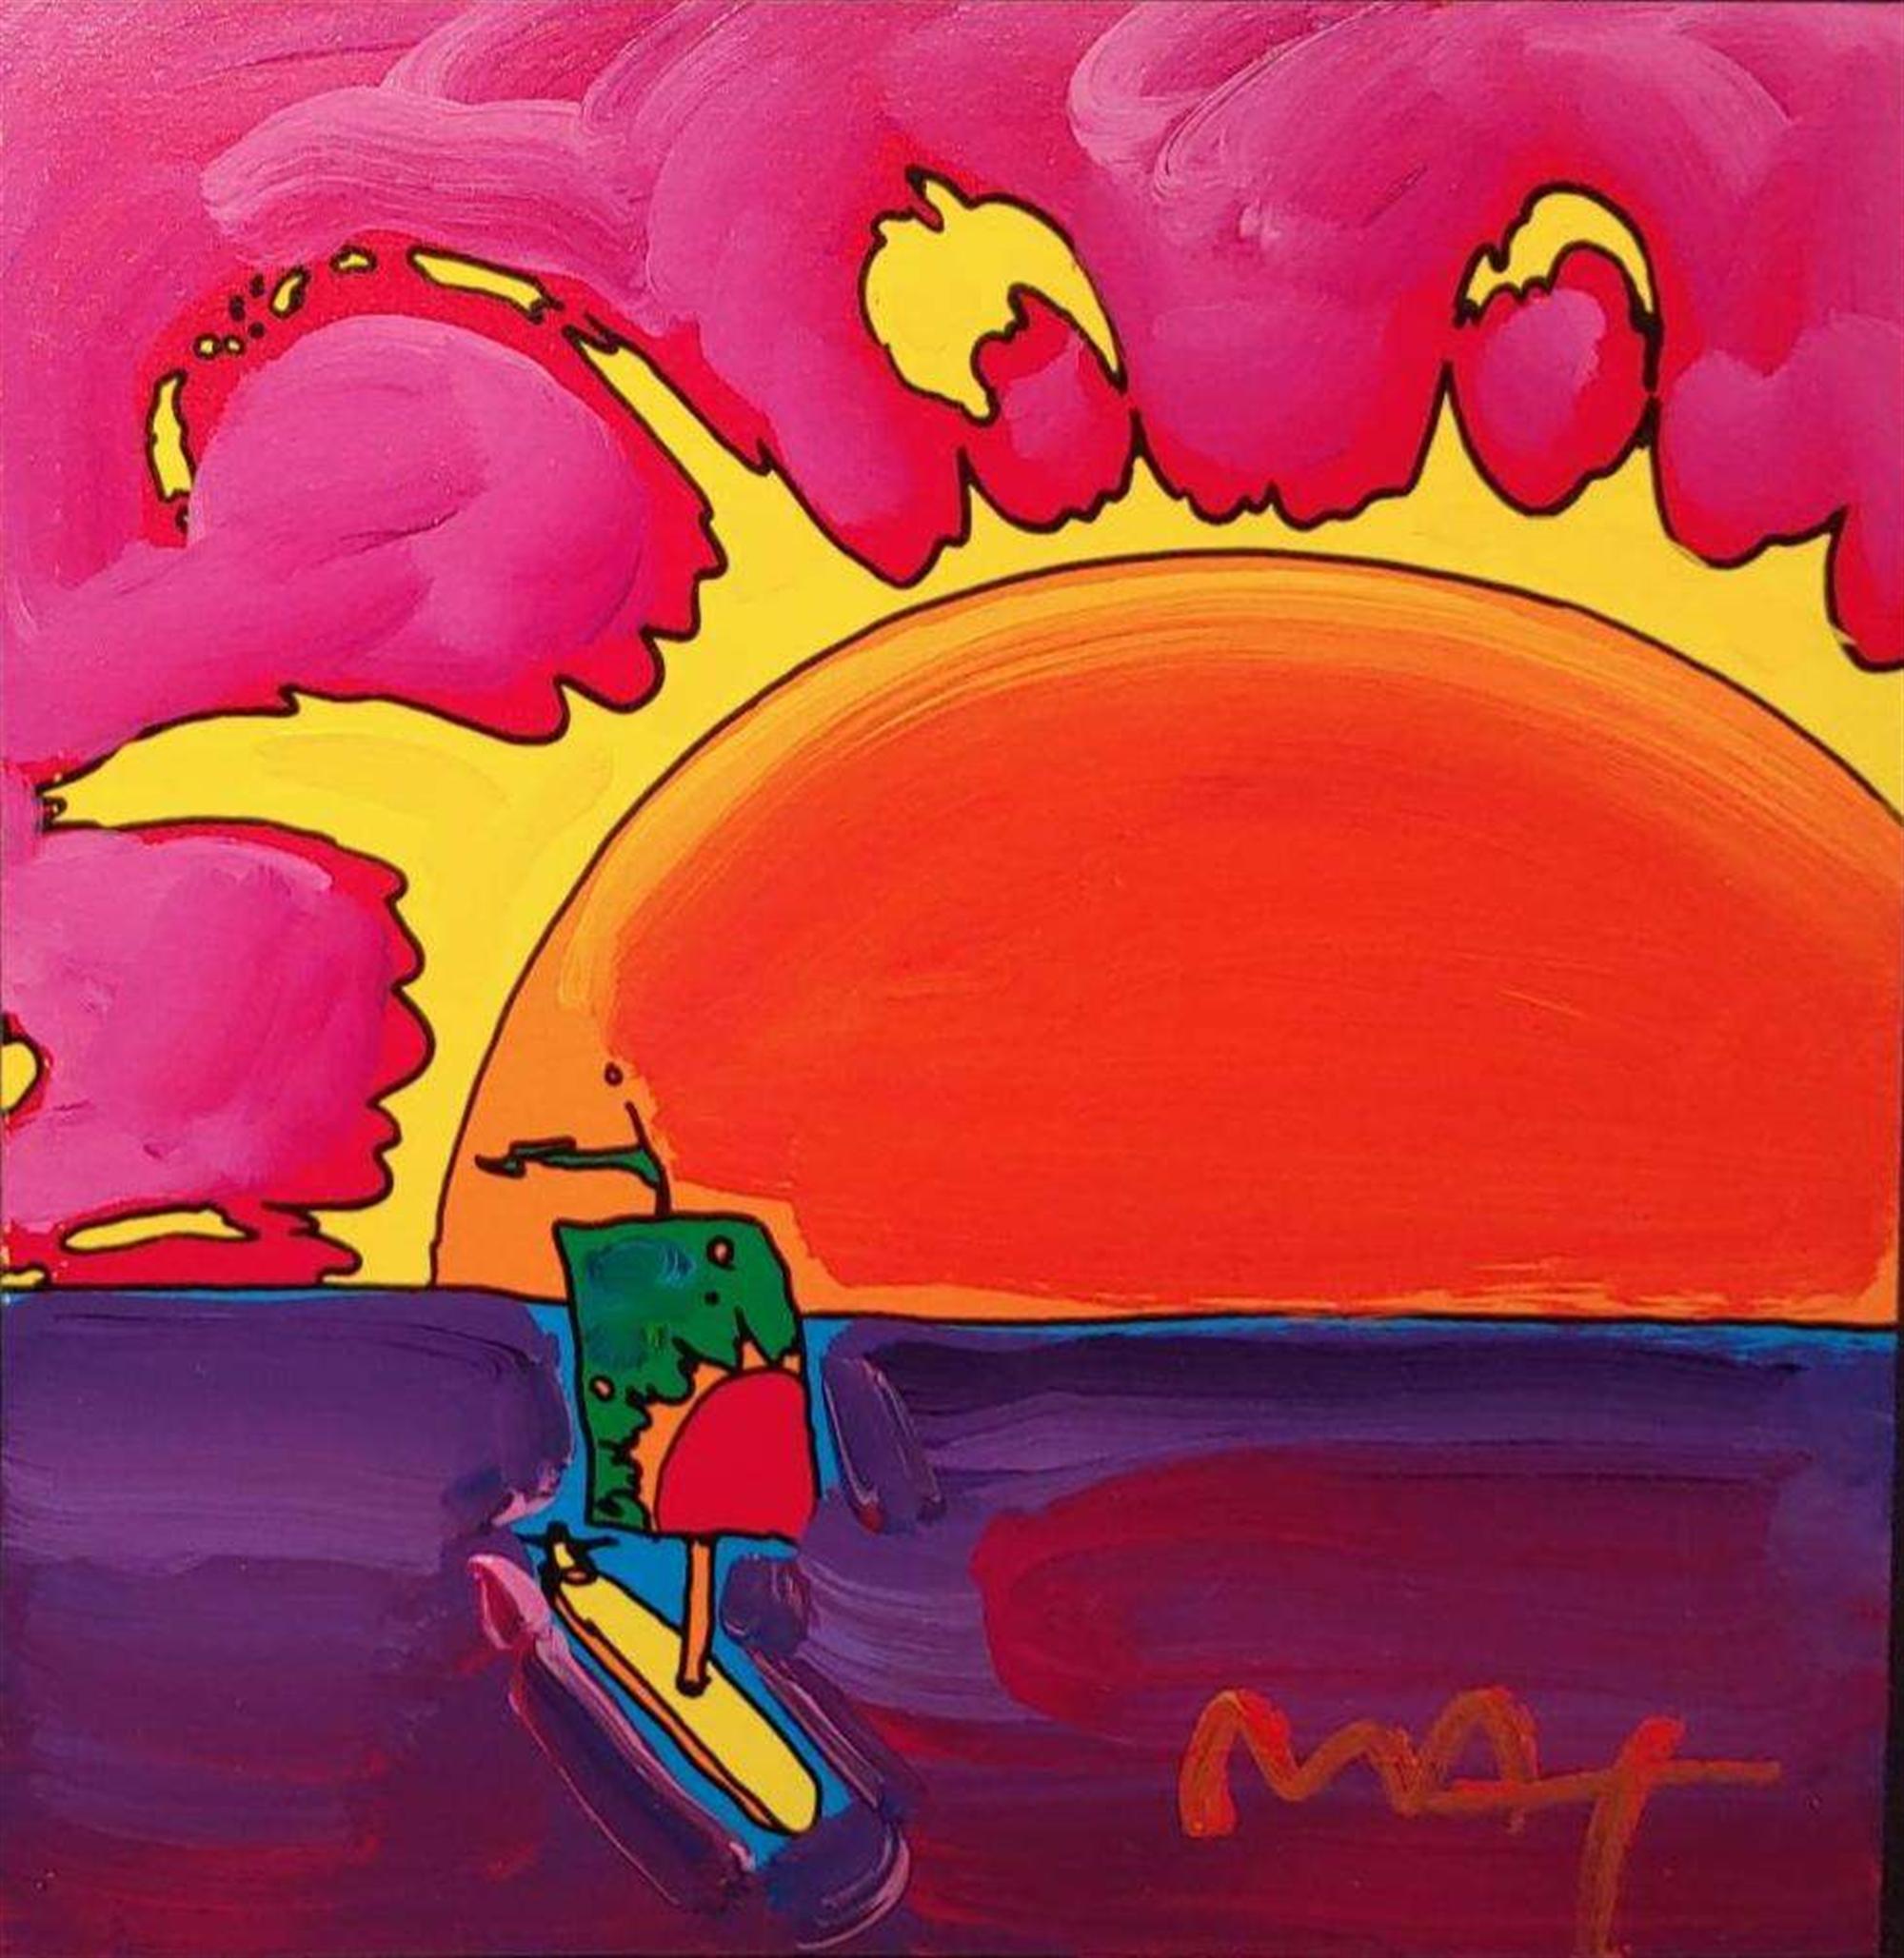 RETRO: SUNRISE SAIL by Peter Max